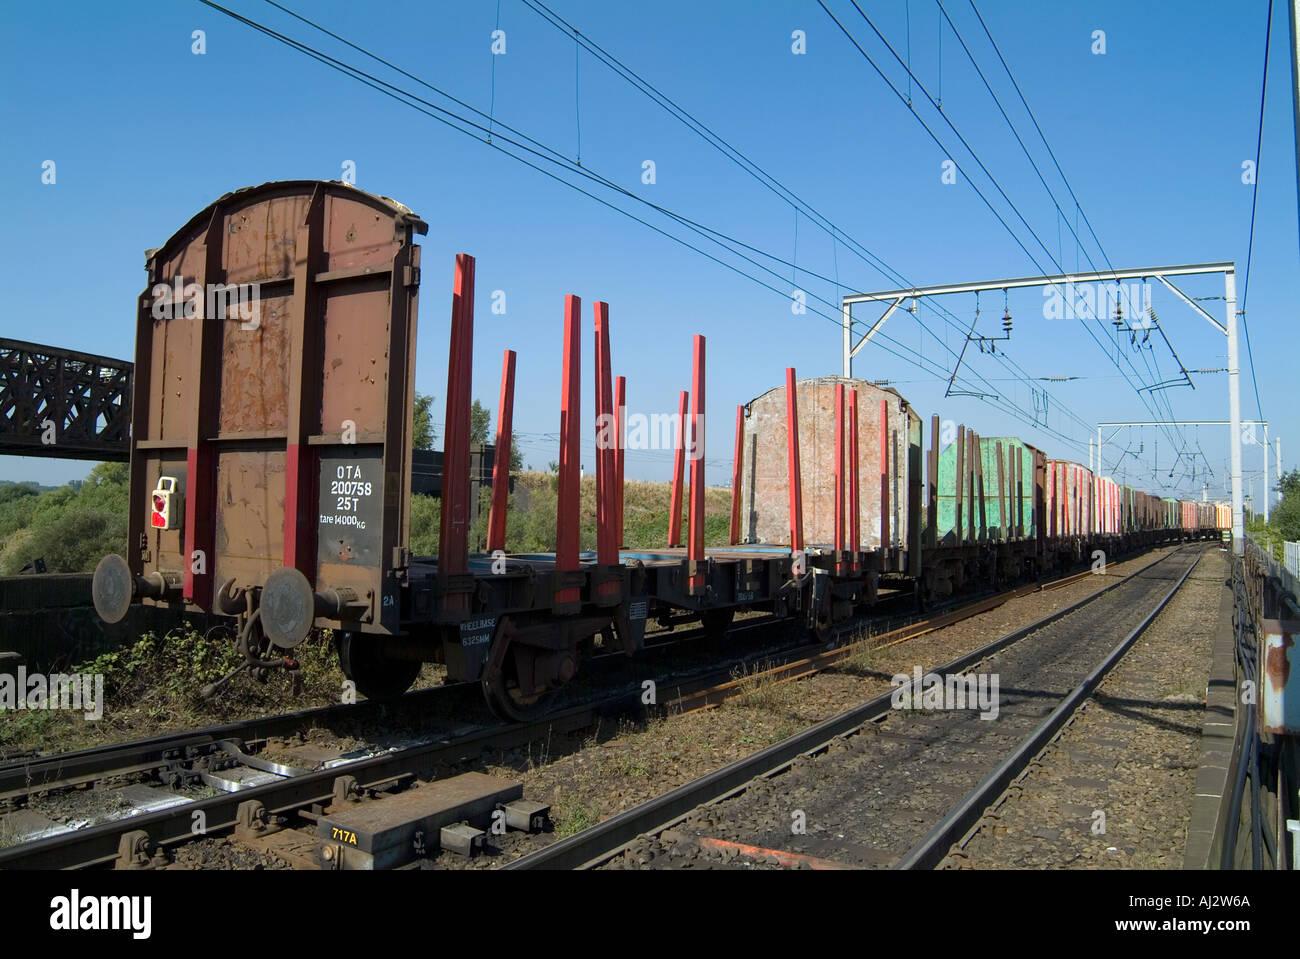 Unladen freight train on main west coast railway line in warrington england UK Stock Photo